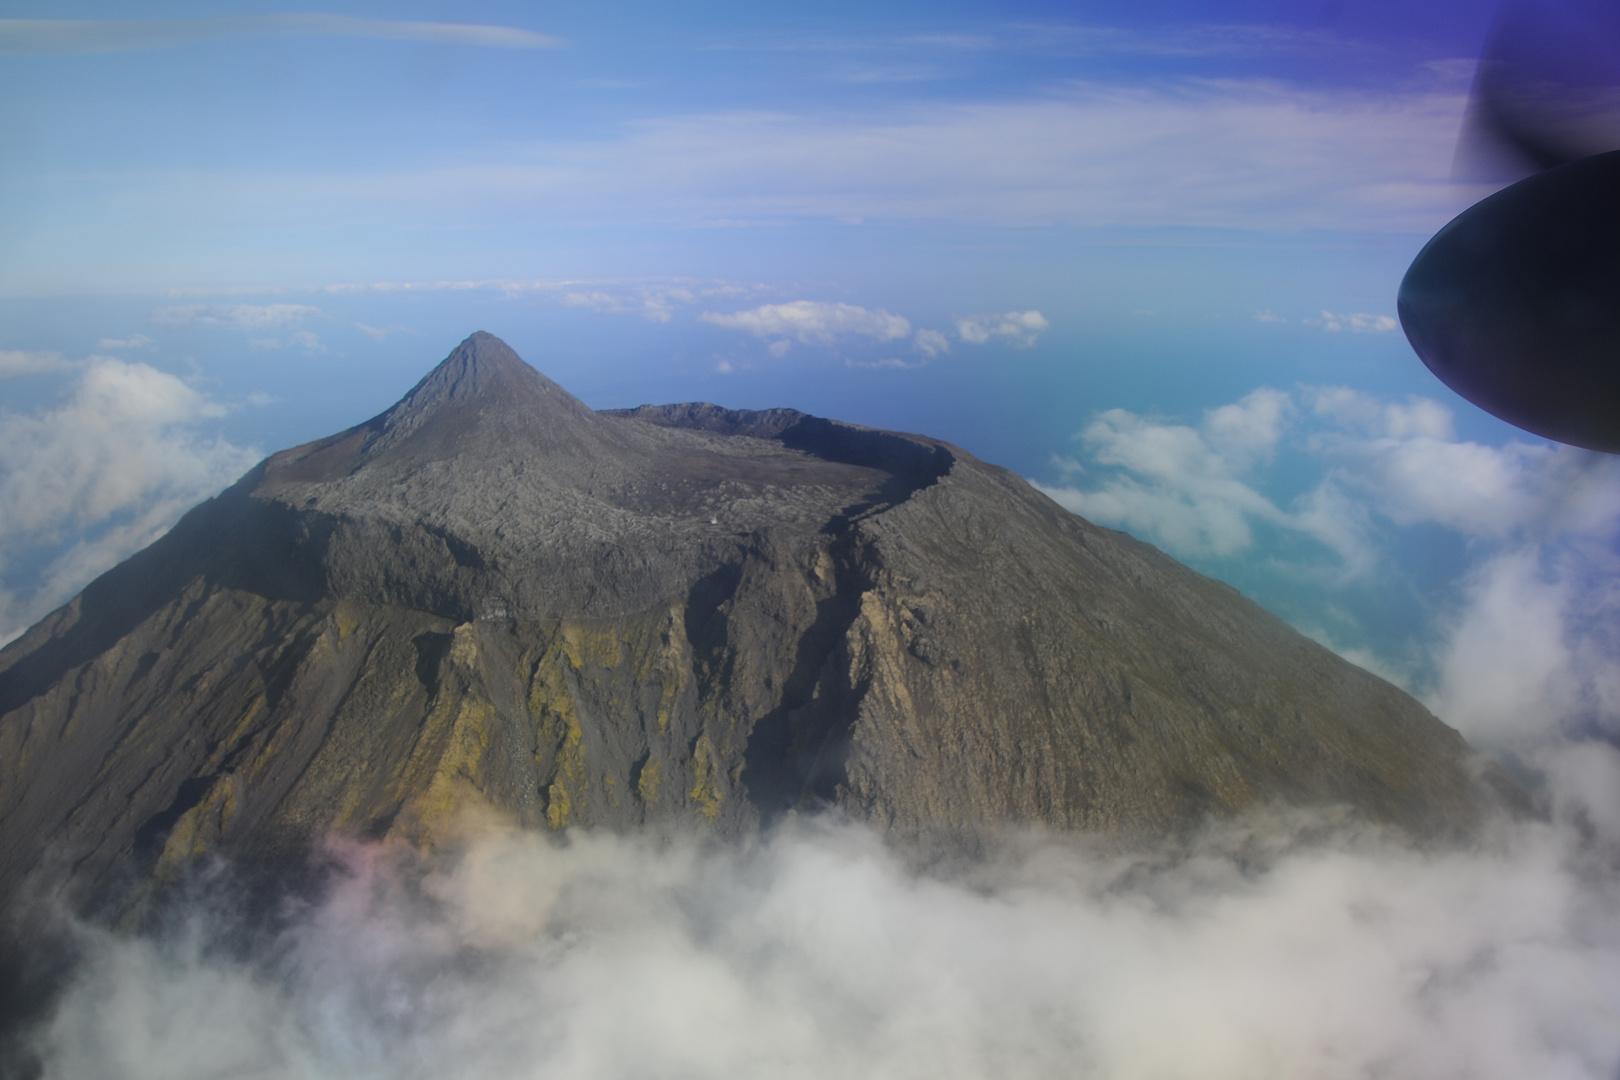 Vulkan Pico auf der Azoreninsel Pico (Portugal)